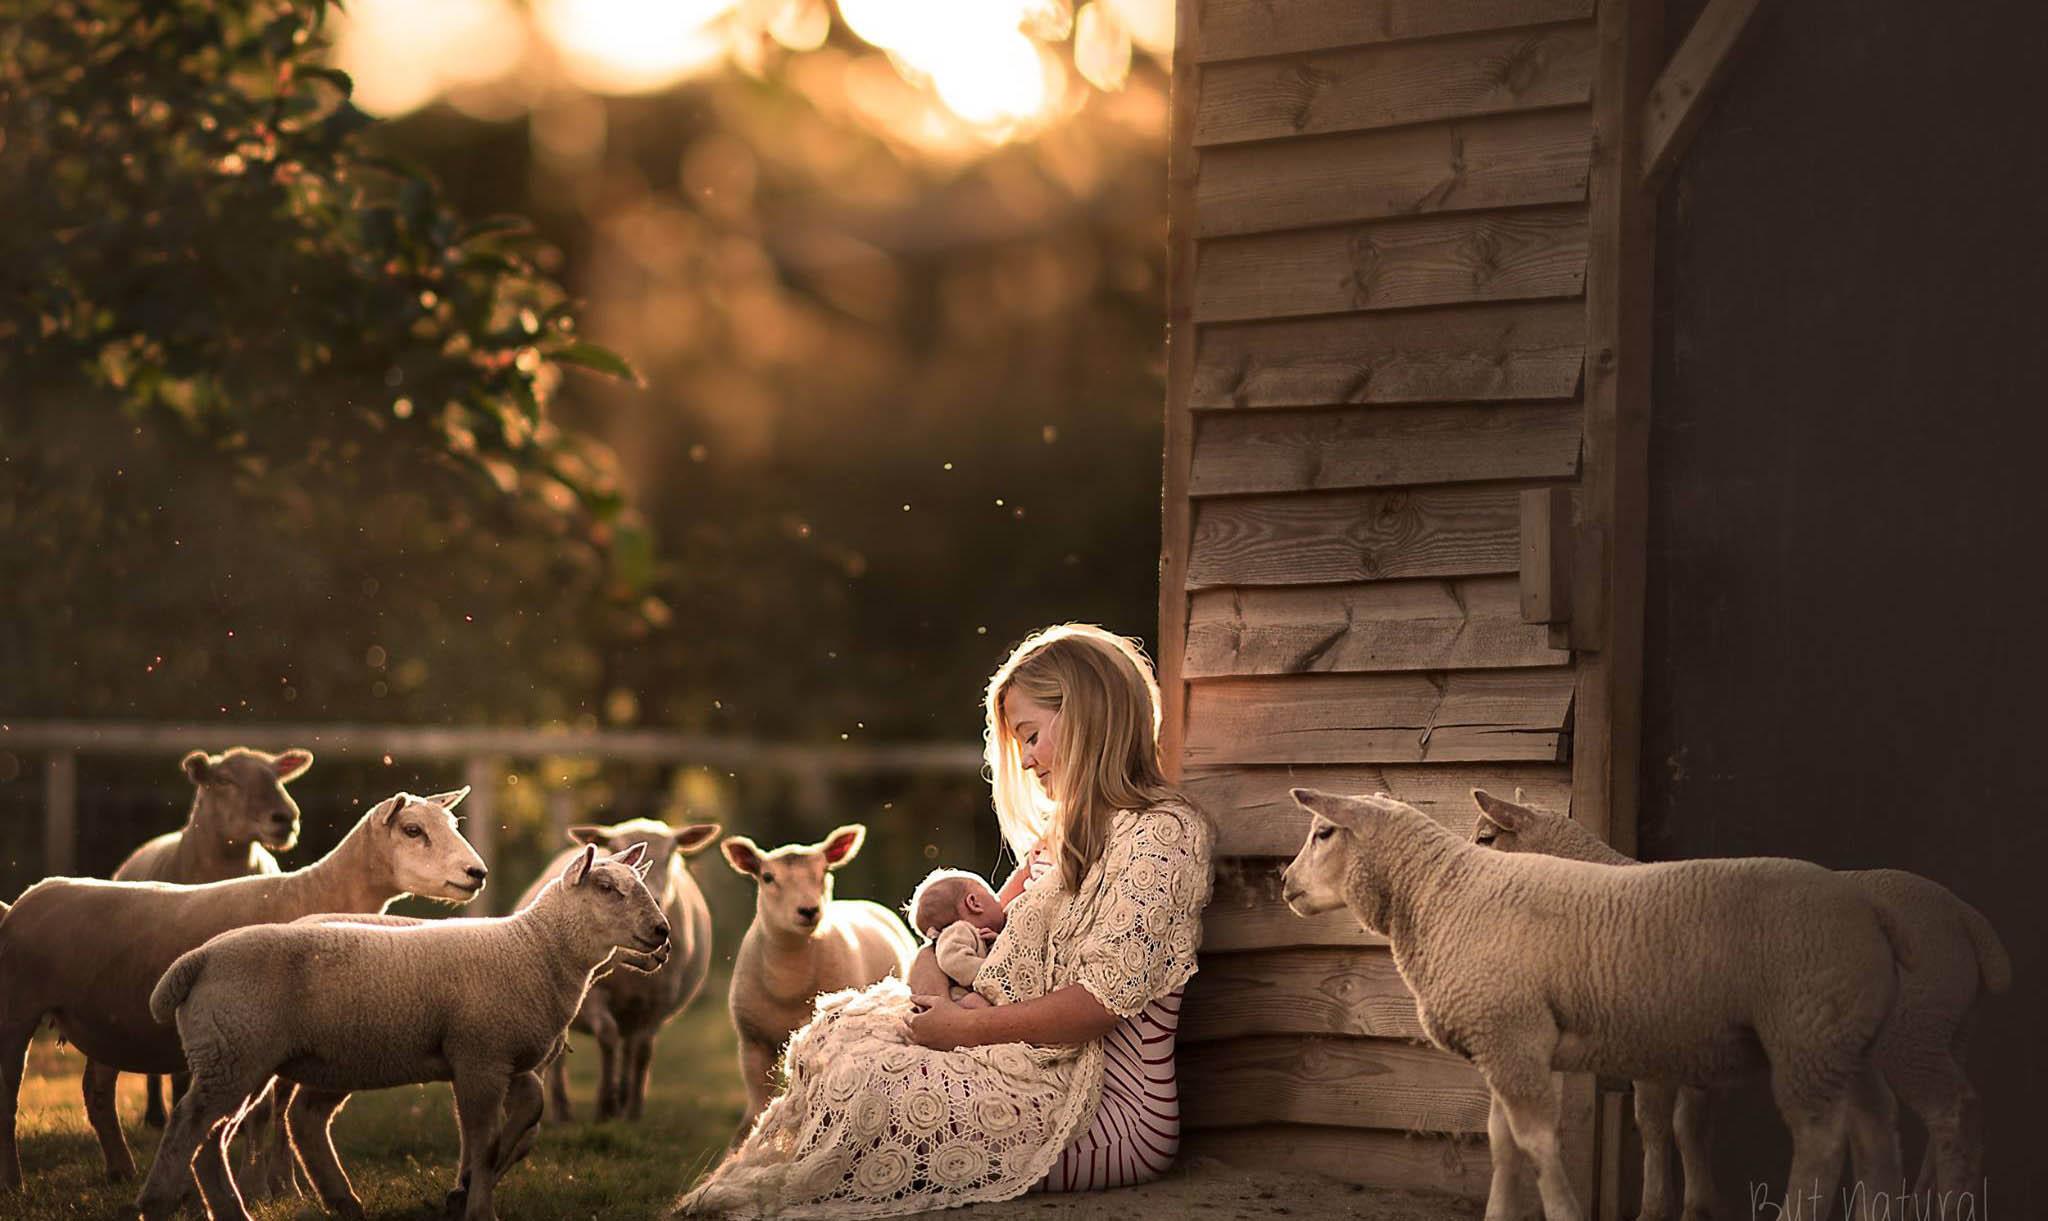 Master class: Promyczki serca - fotografia dziecięca i rodzinna Sujata Setia (But Natural Photography)